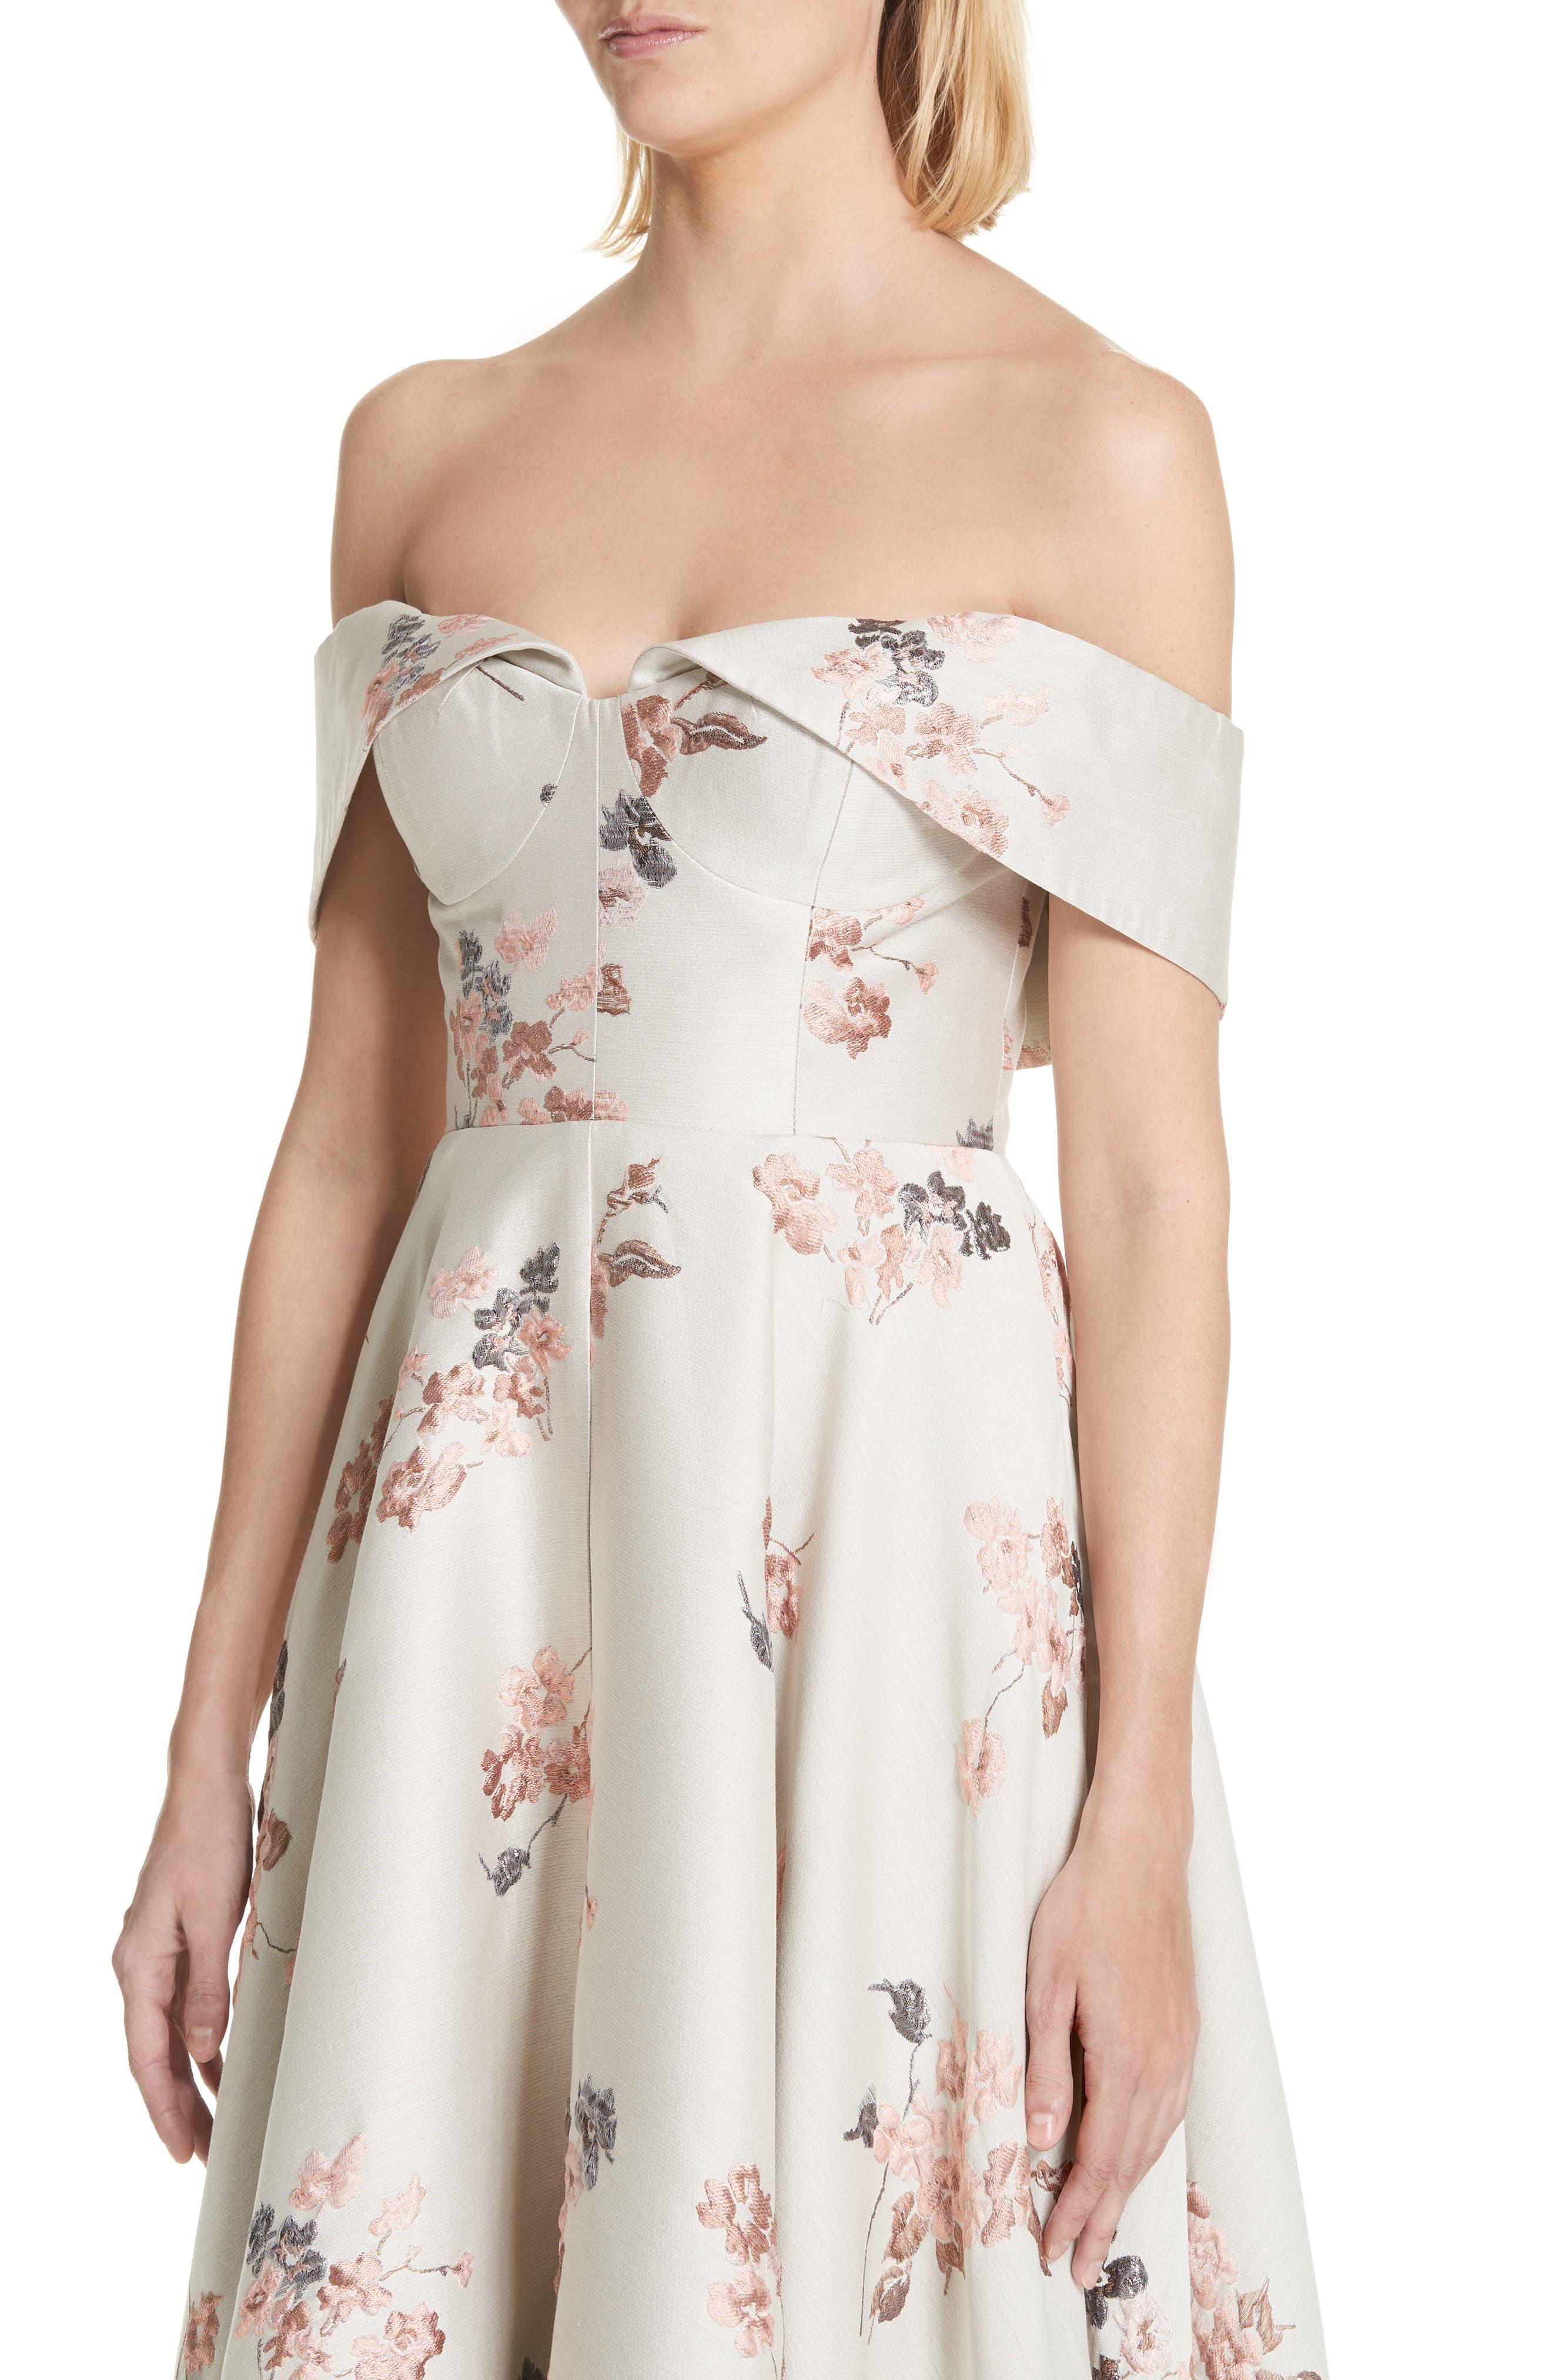 Metallic Floral Jacquard Off the Shoulder Dress,                             Alternate thumbnail 4, color,                             275